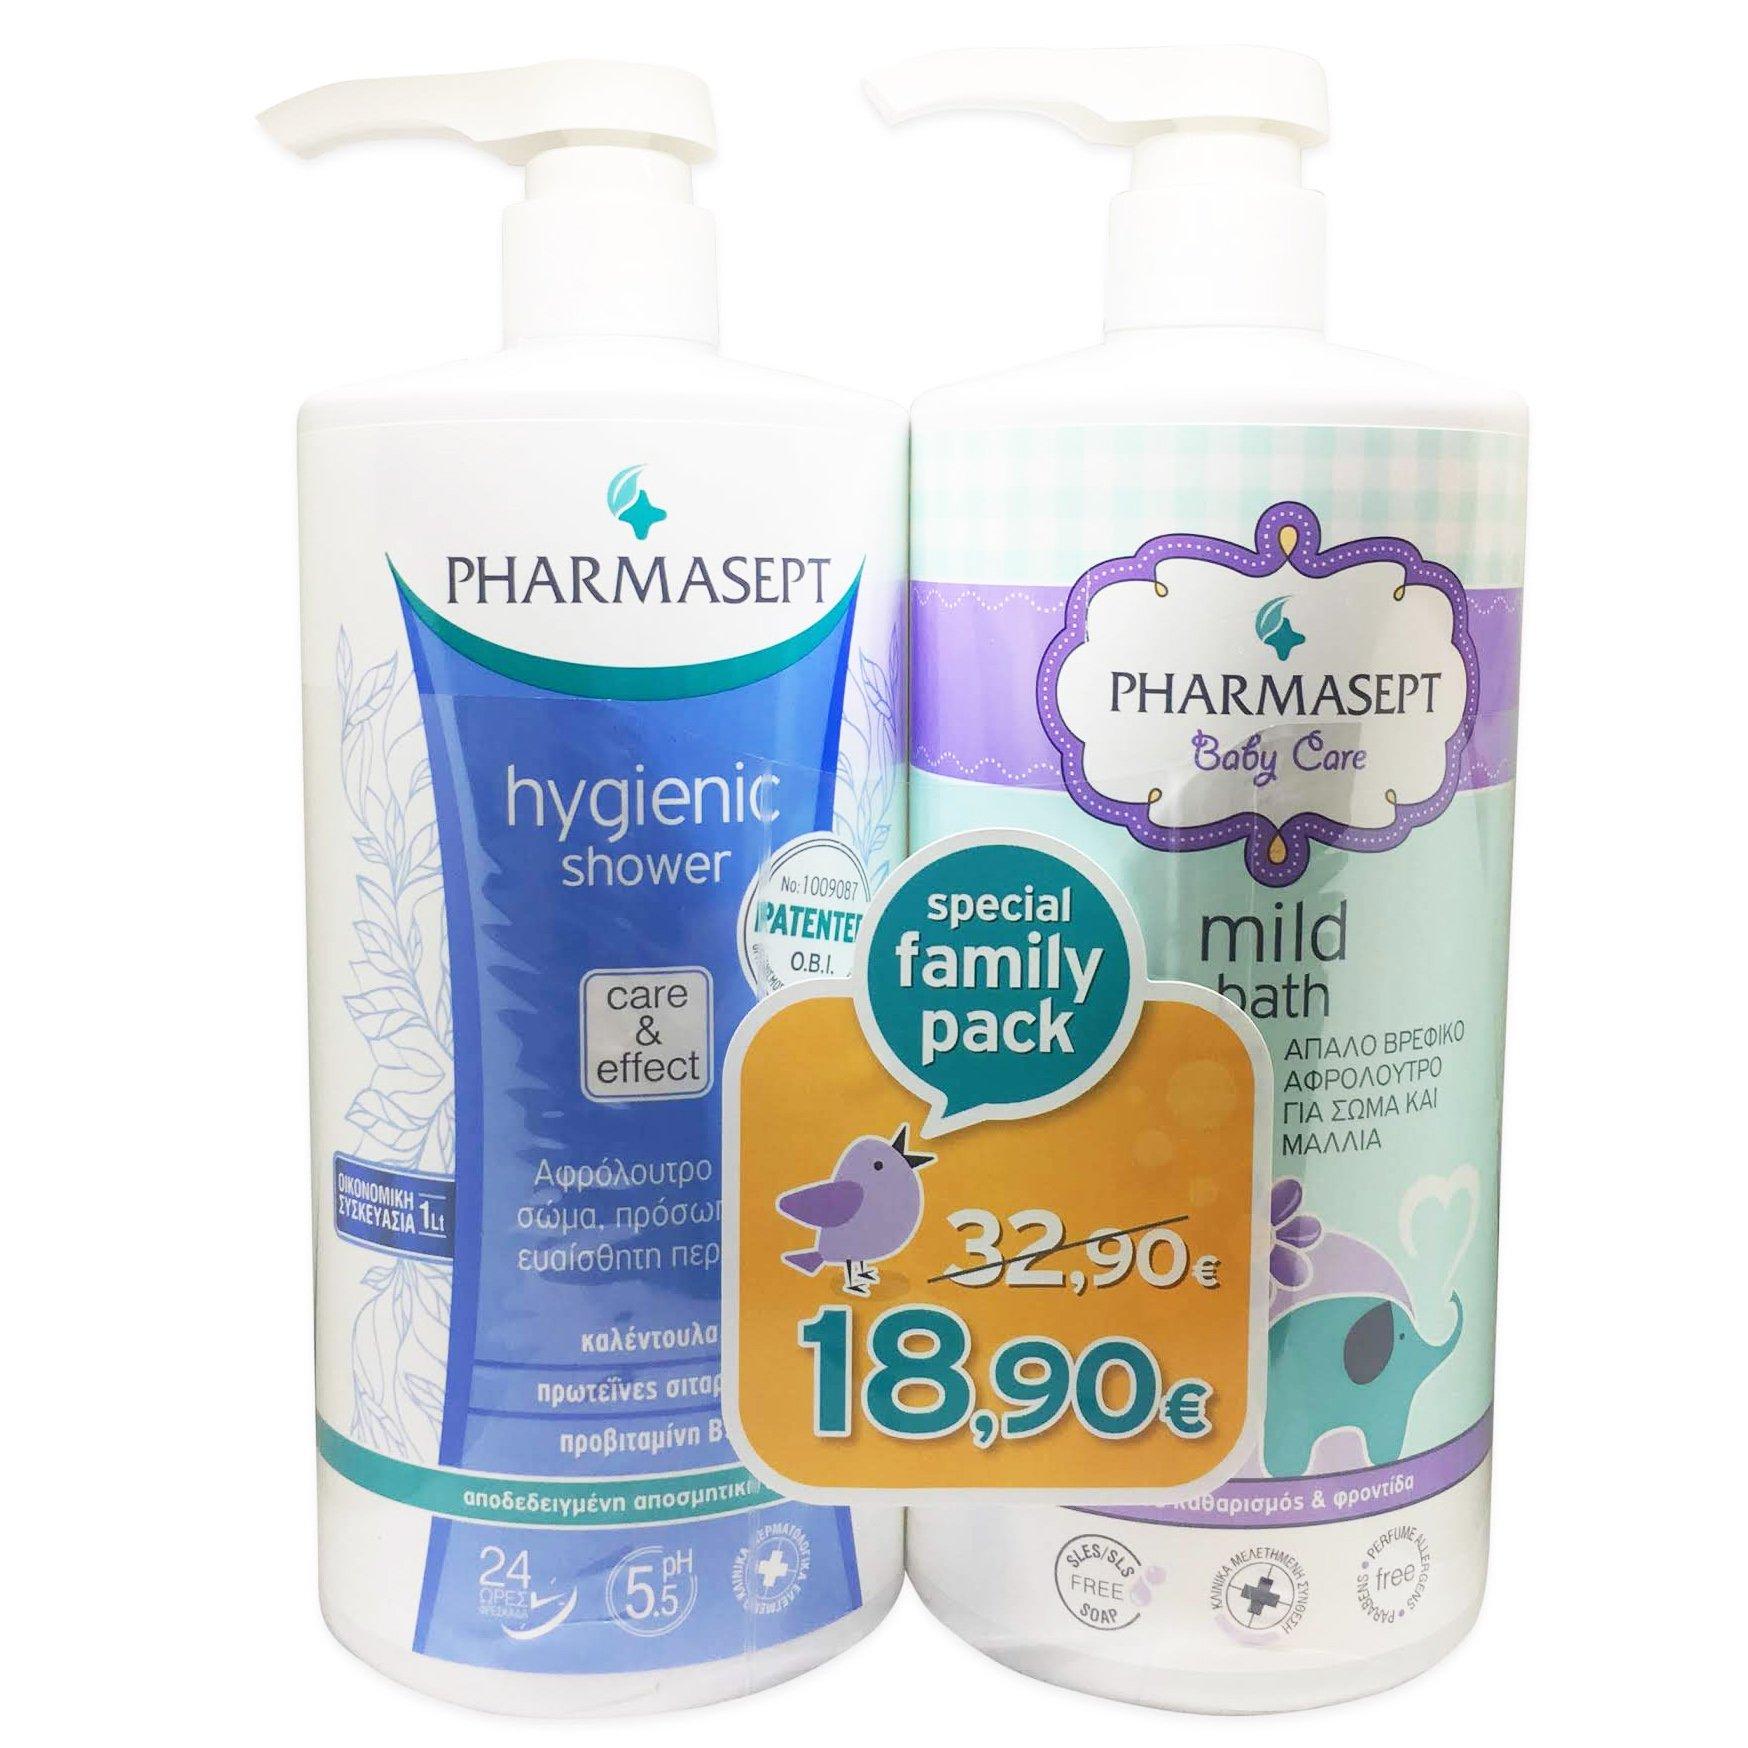 05a0eceb6f5 pharm24 Pharmasept Πακέτο Προσφοράς Hygienic Shower 1Lt & Baby Care Mild  Bath 1Lt σε Ειδική Τιμή